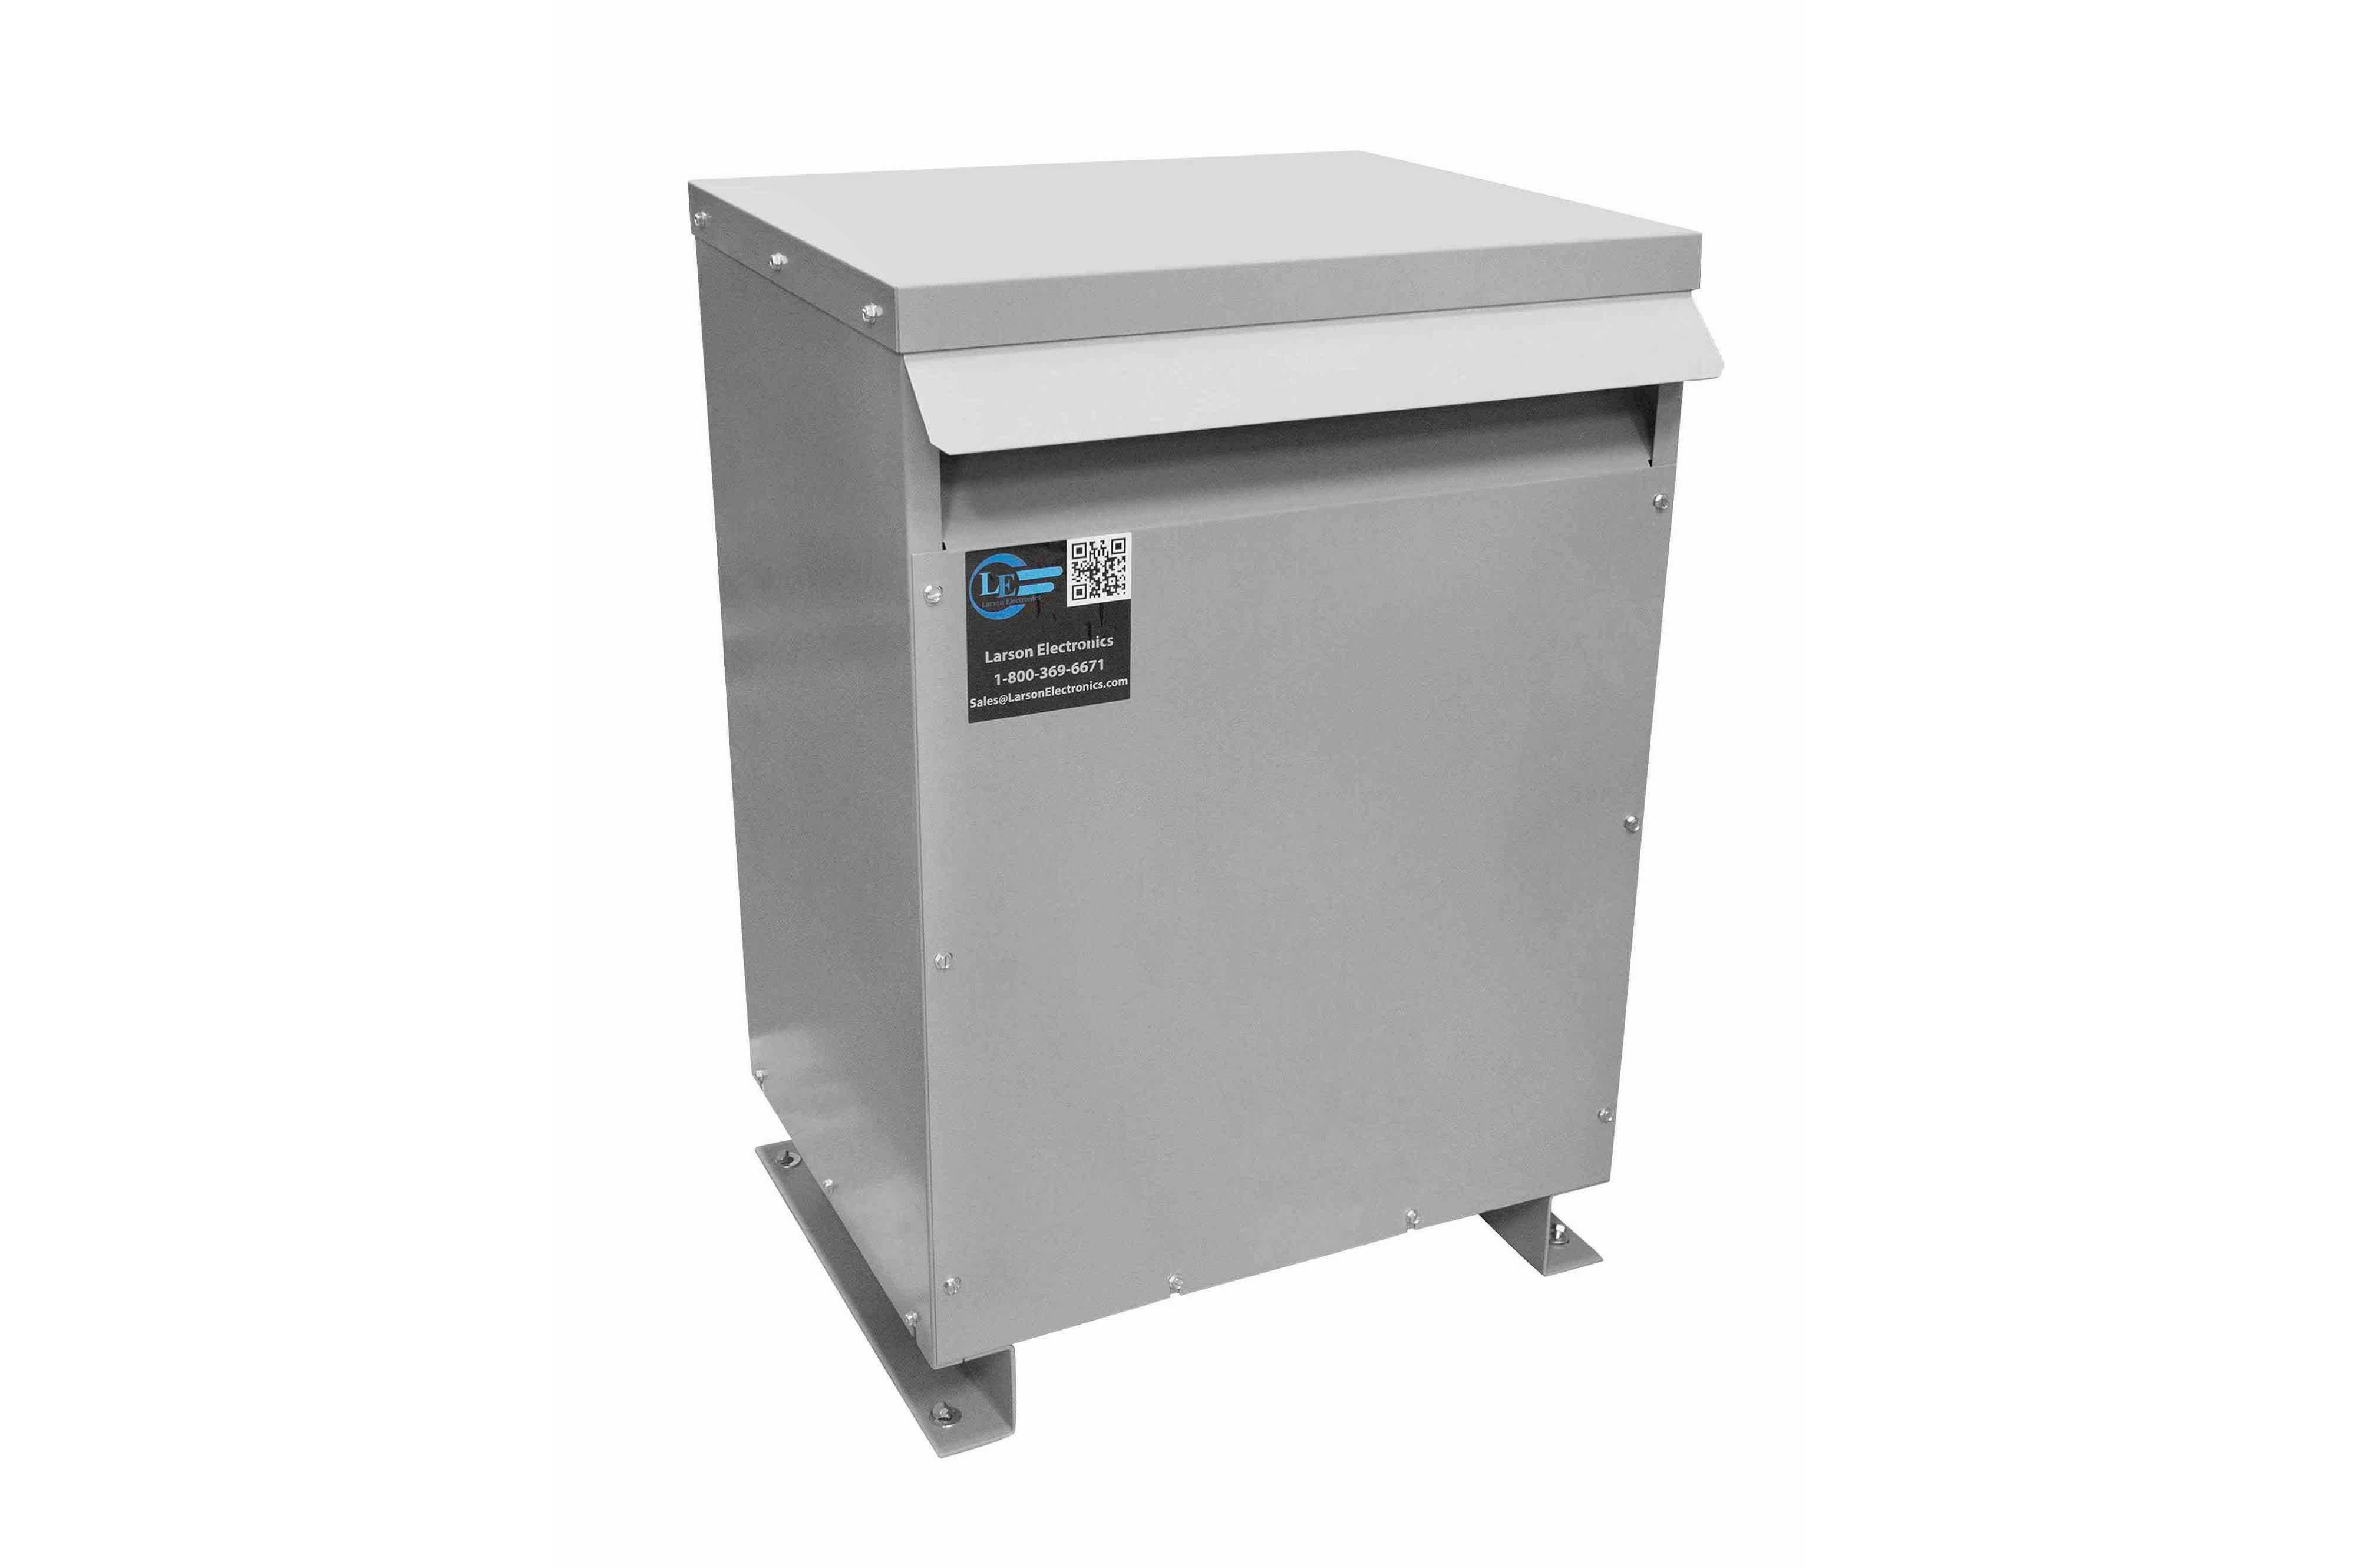 400 kVA 3PH Isolation Transformer, 230V Wye Primary, 480Y/277 Wye-N Secondary, N3R, Ventilated, 60 Hz